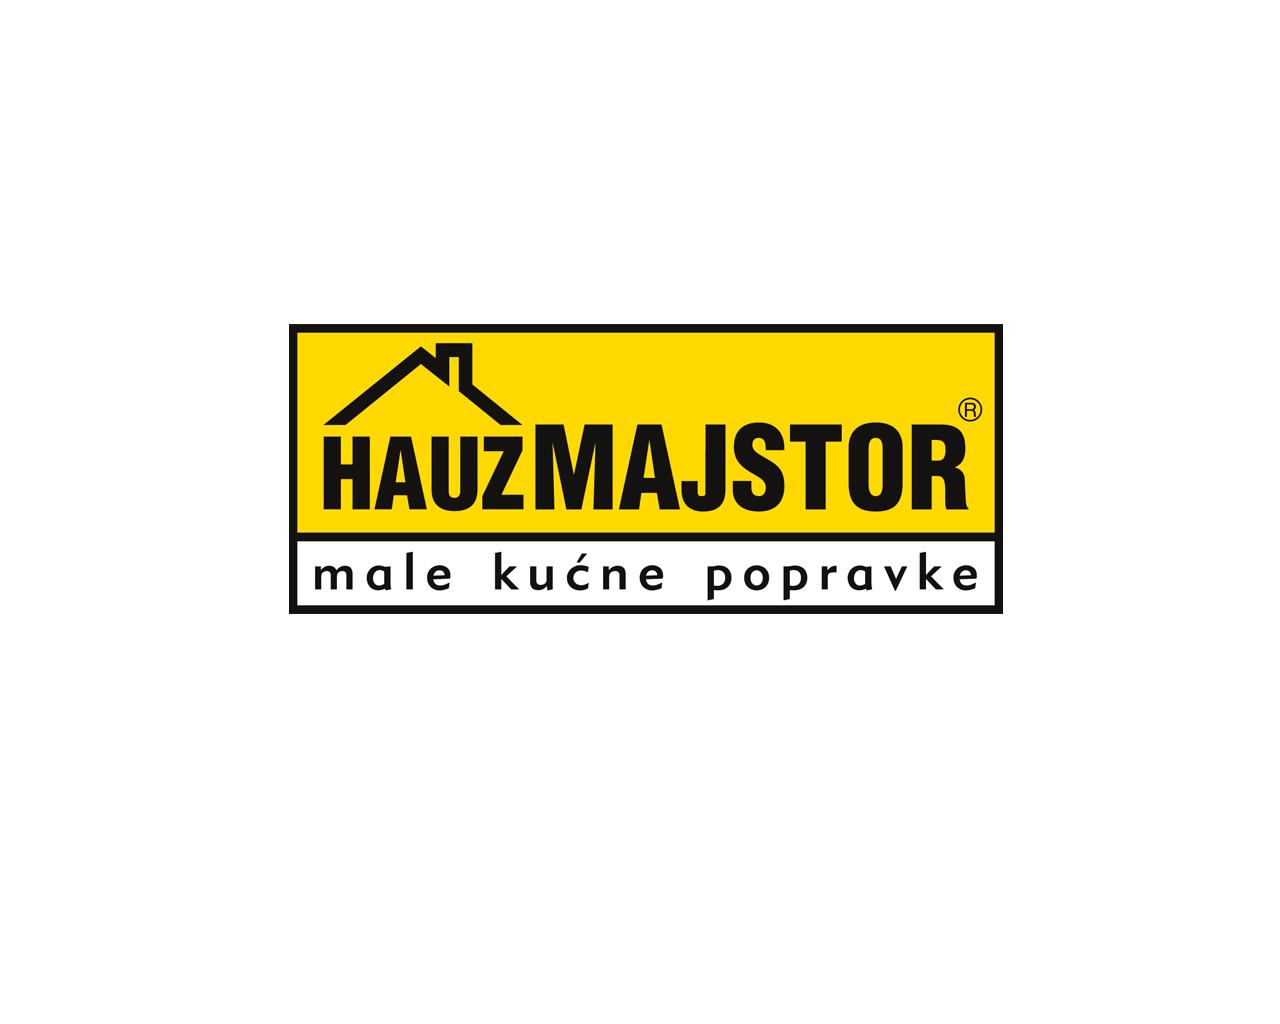 hauzmajstor1